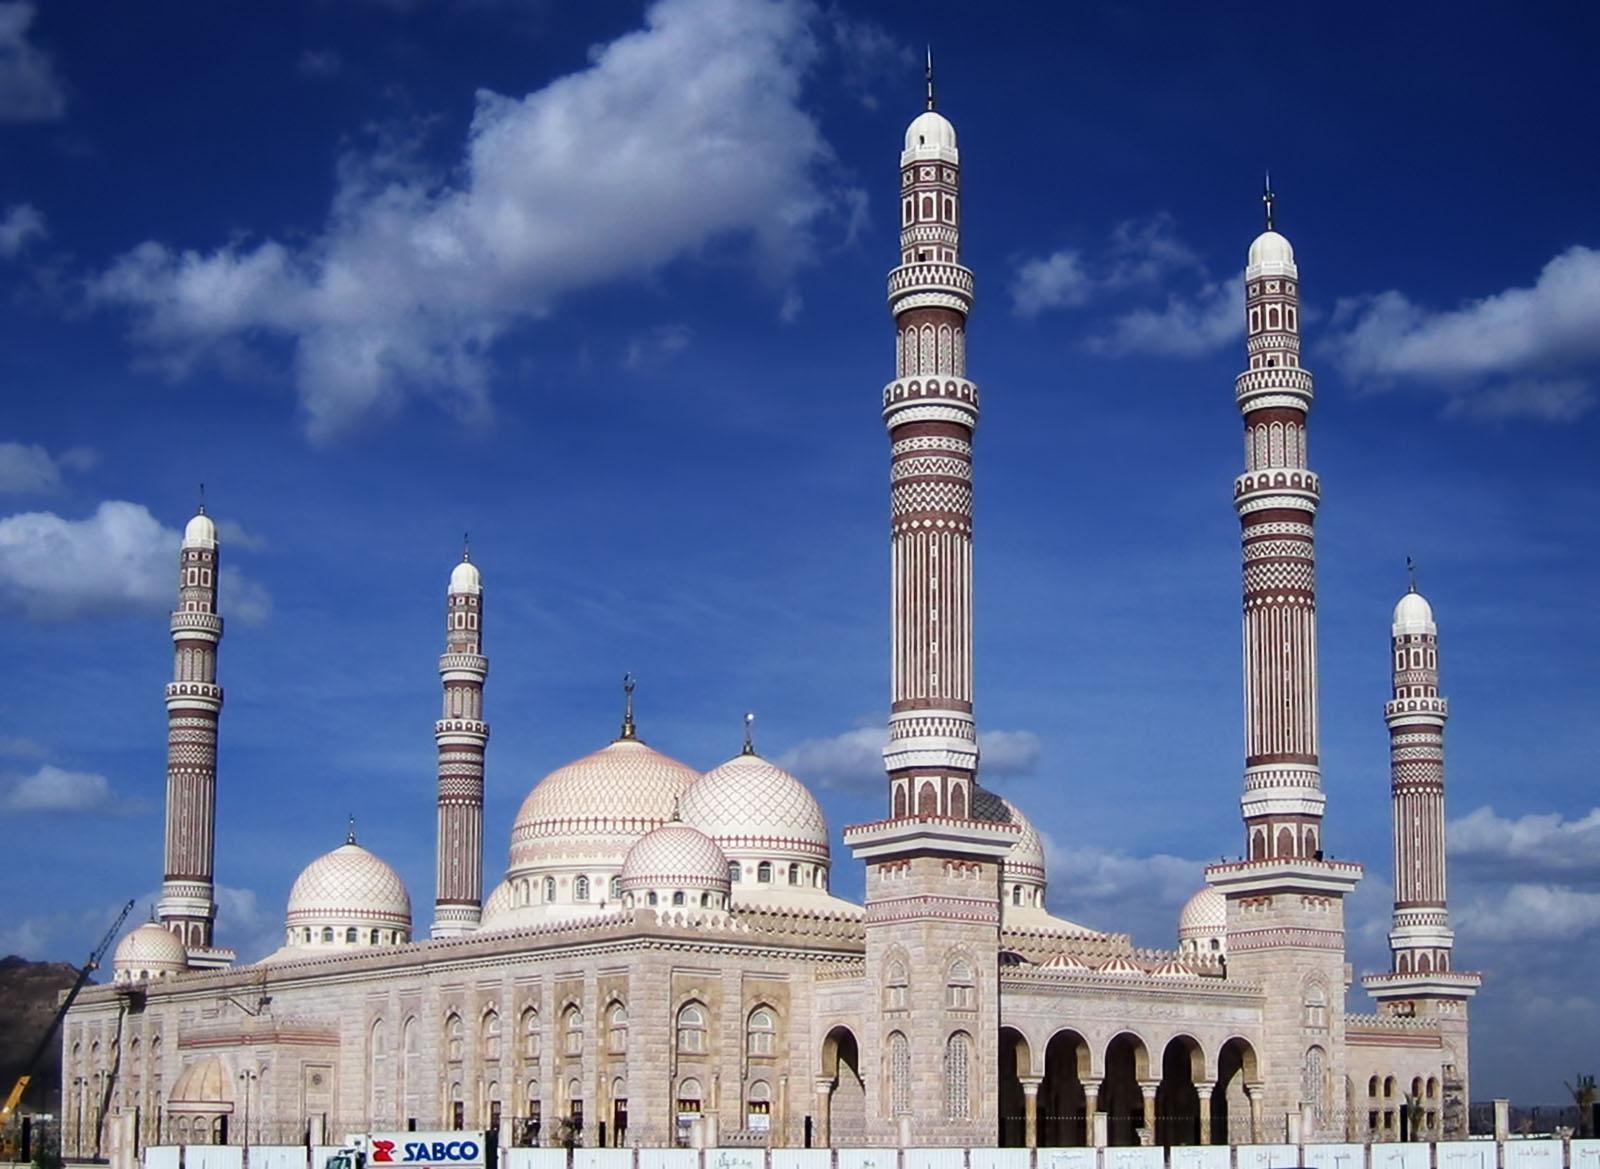 High Resolution Wallpaper | Al Saleh Mosque 1600x1169 px